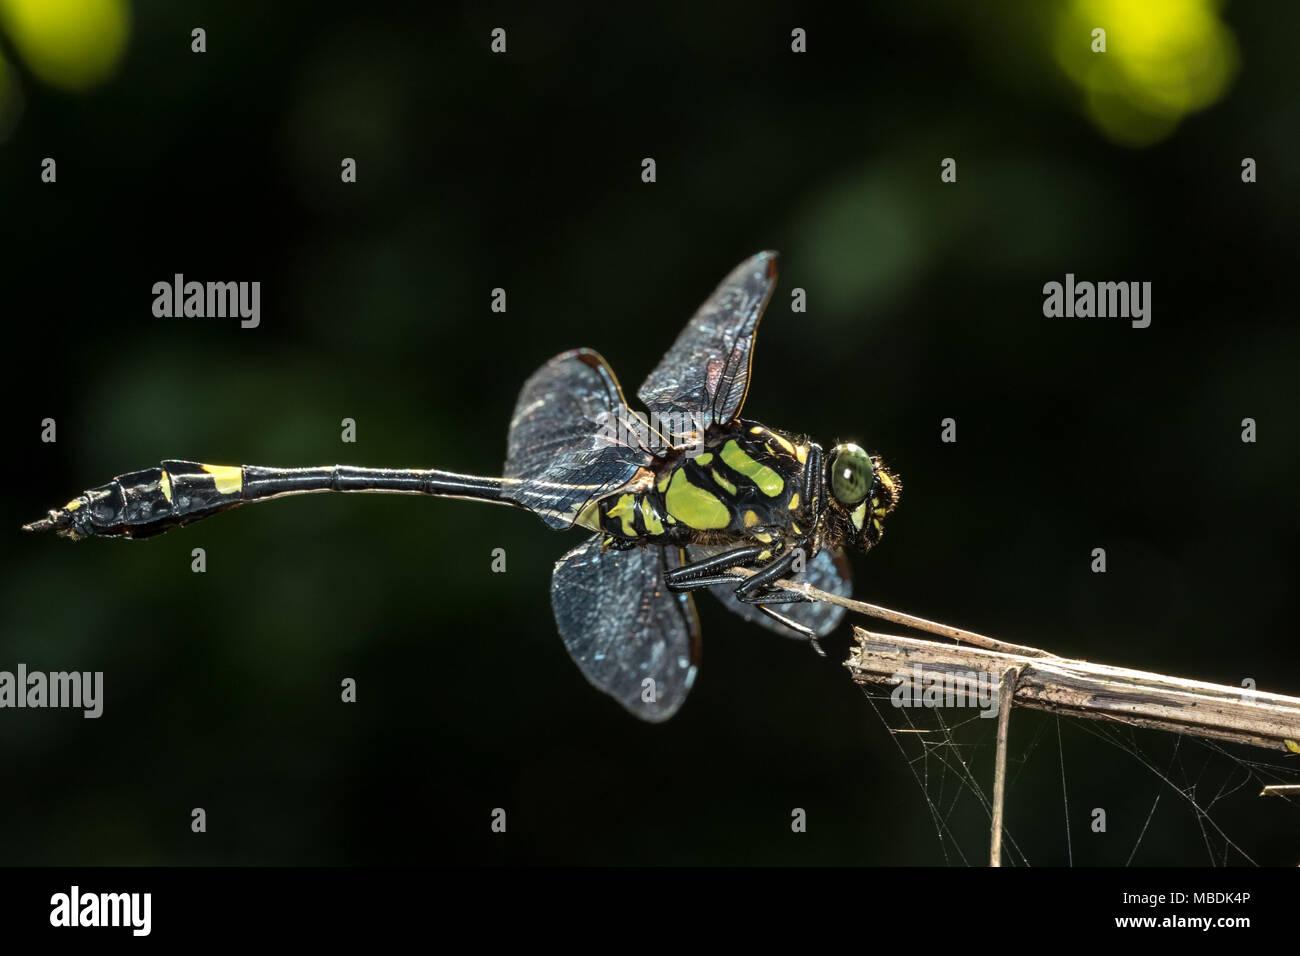 Endangered dragonfly - Chinese Tiger (Gomphidia kelloggi